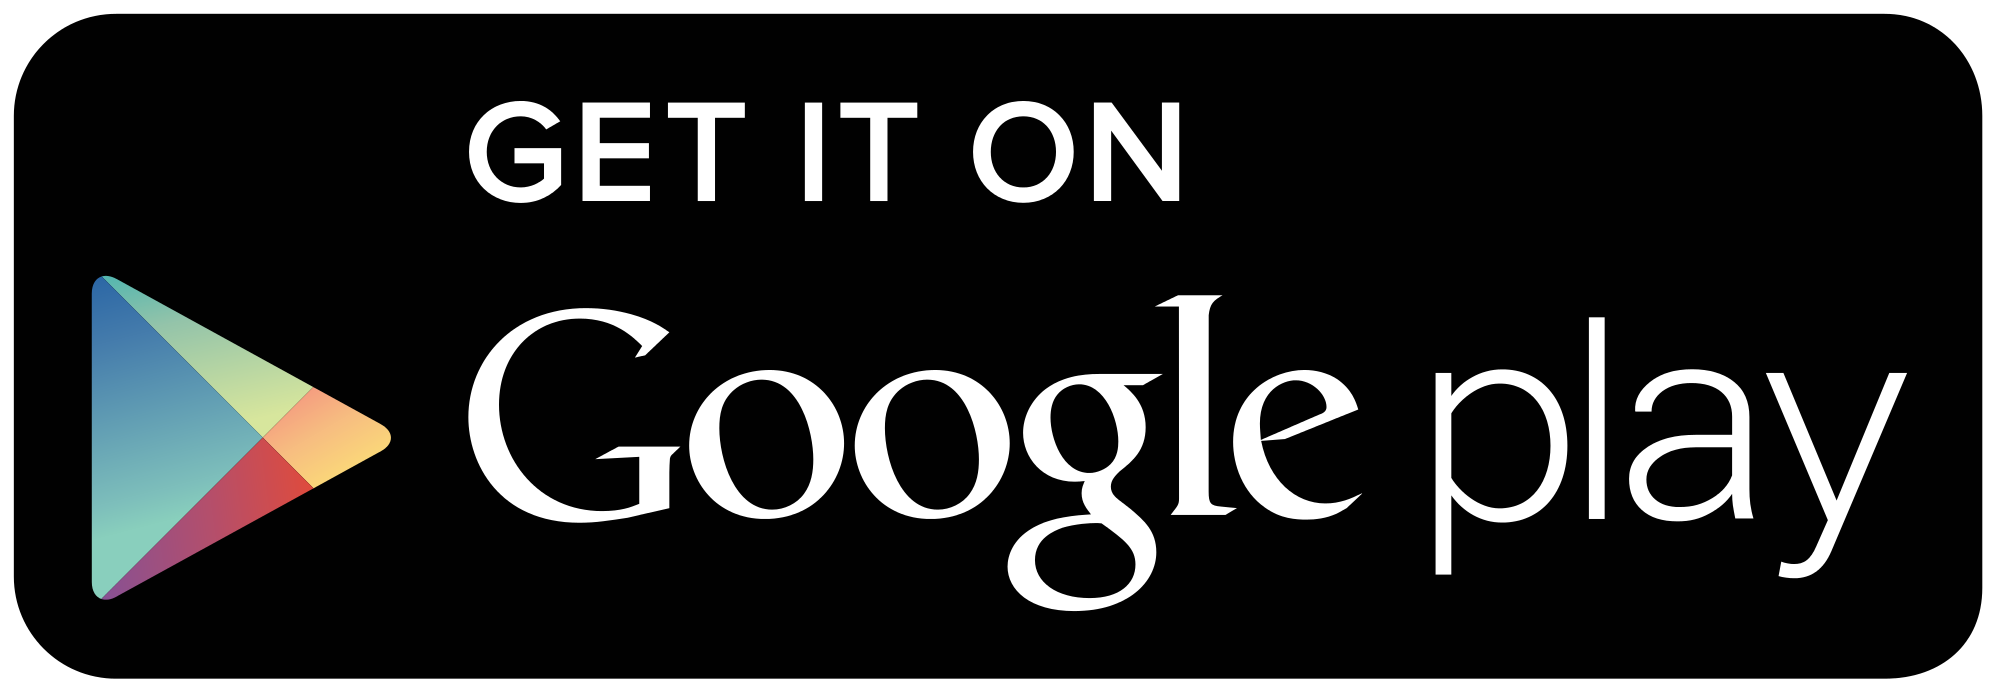 Google-Play-1.png